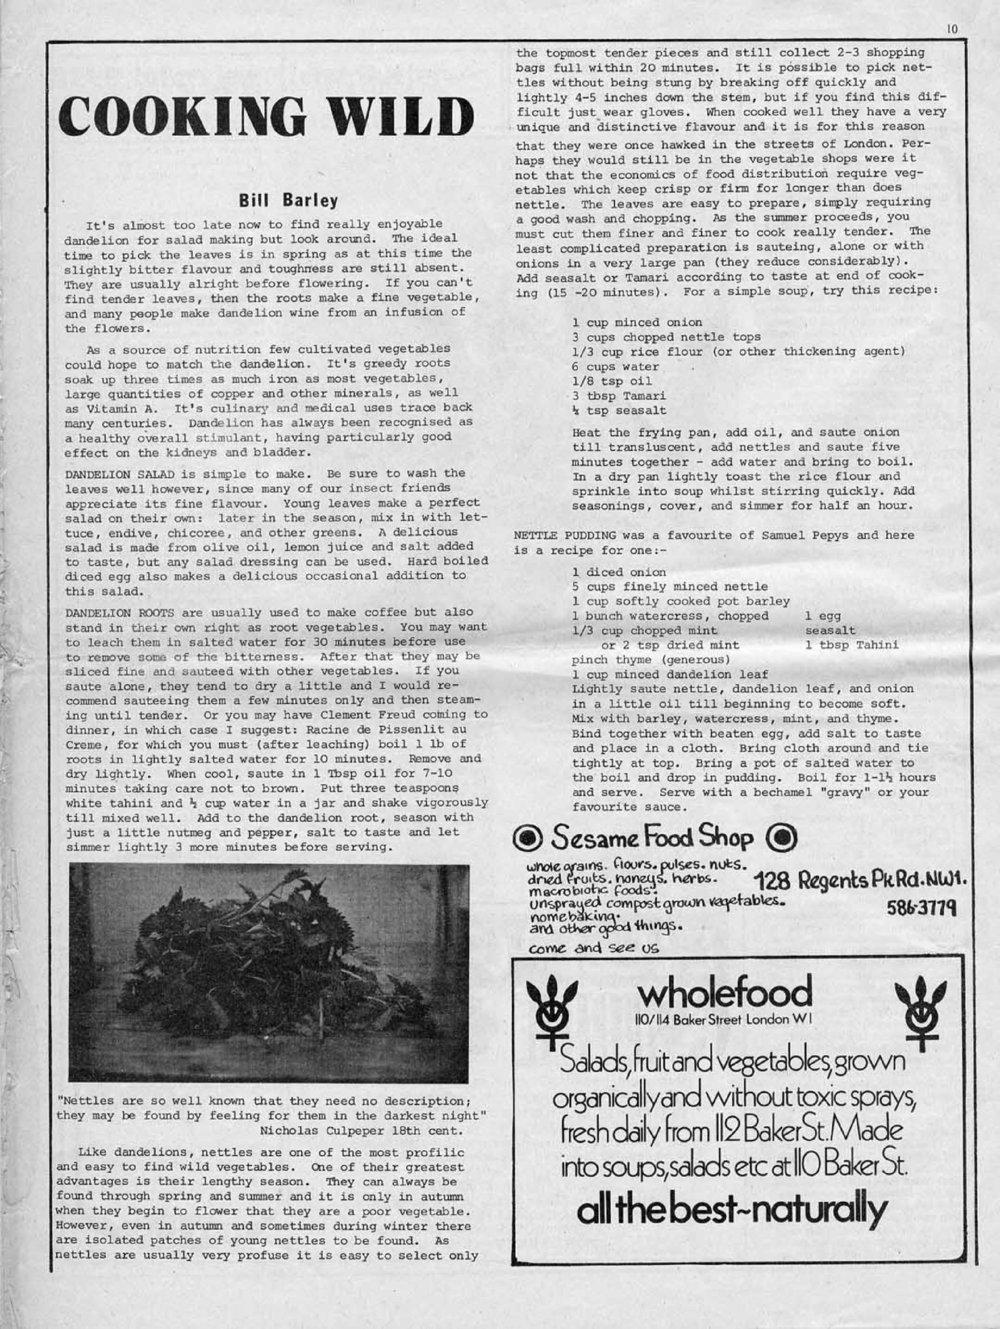 seed-v1-n3-april1972-10.jpg